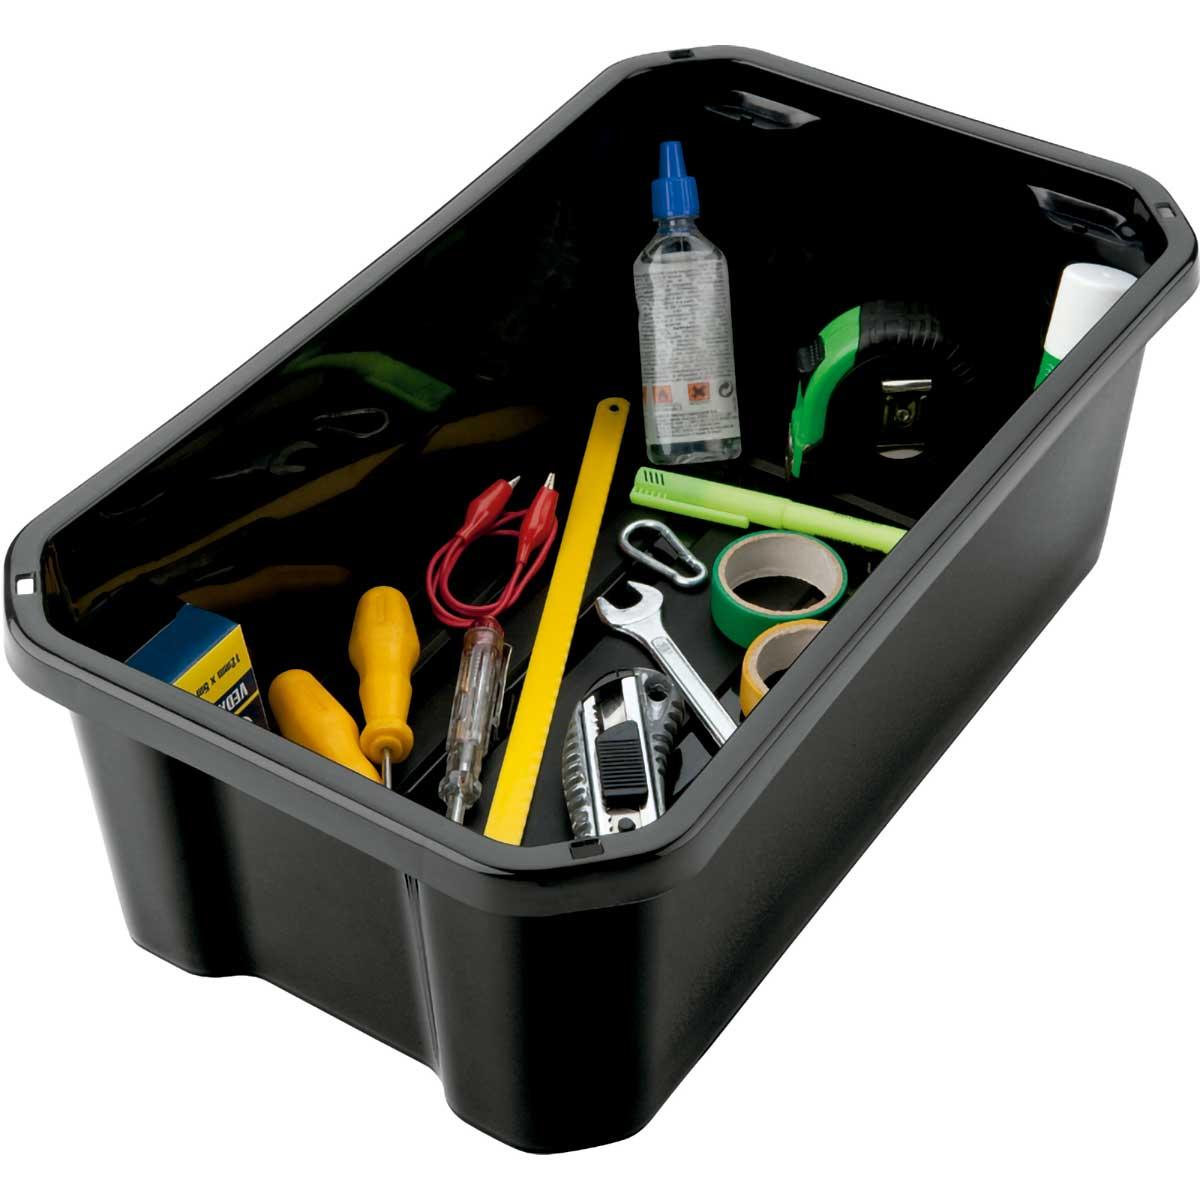 Caixa Organizadora Plástica Retangular Preta